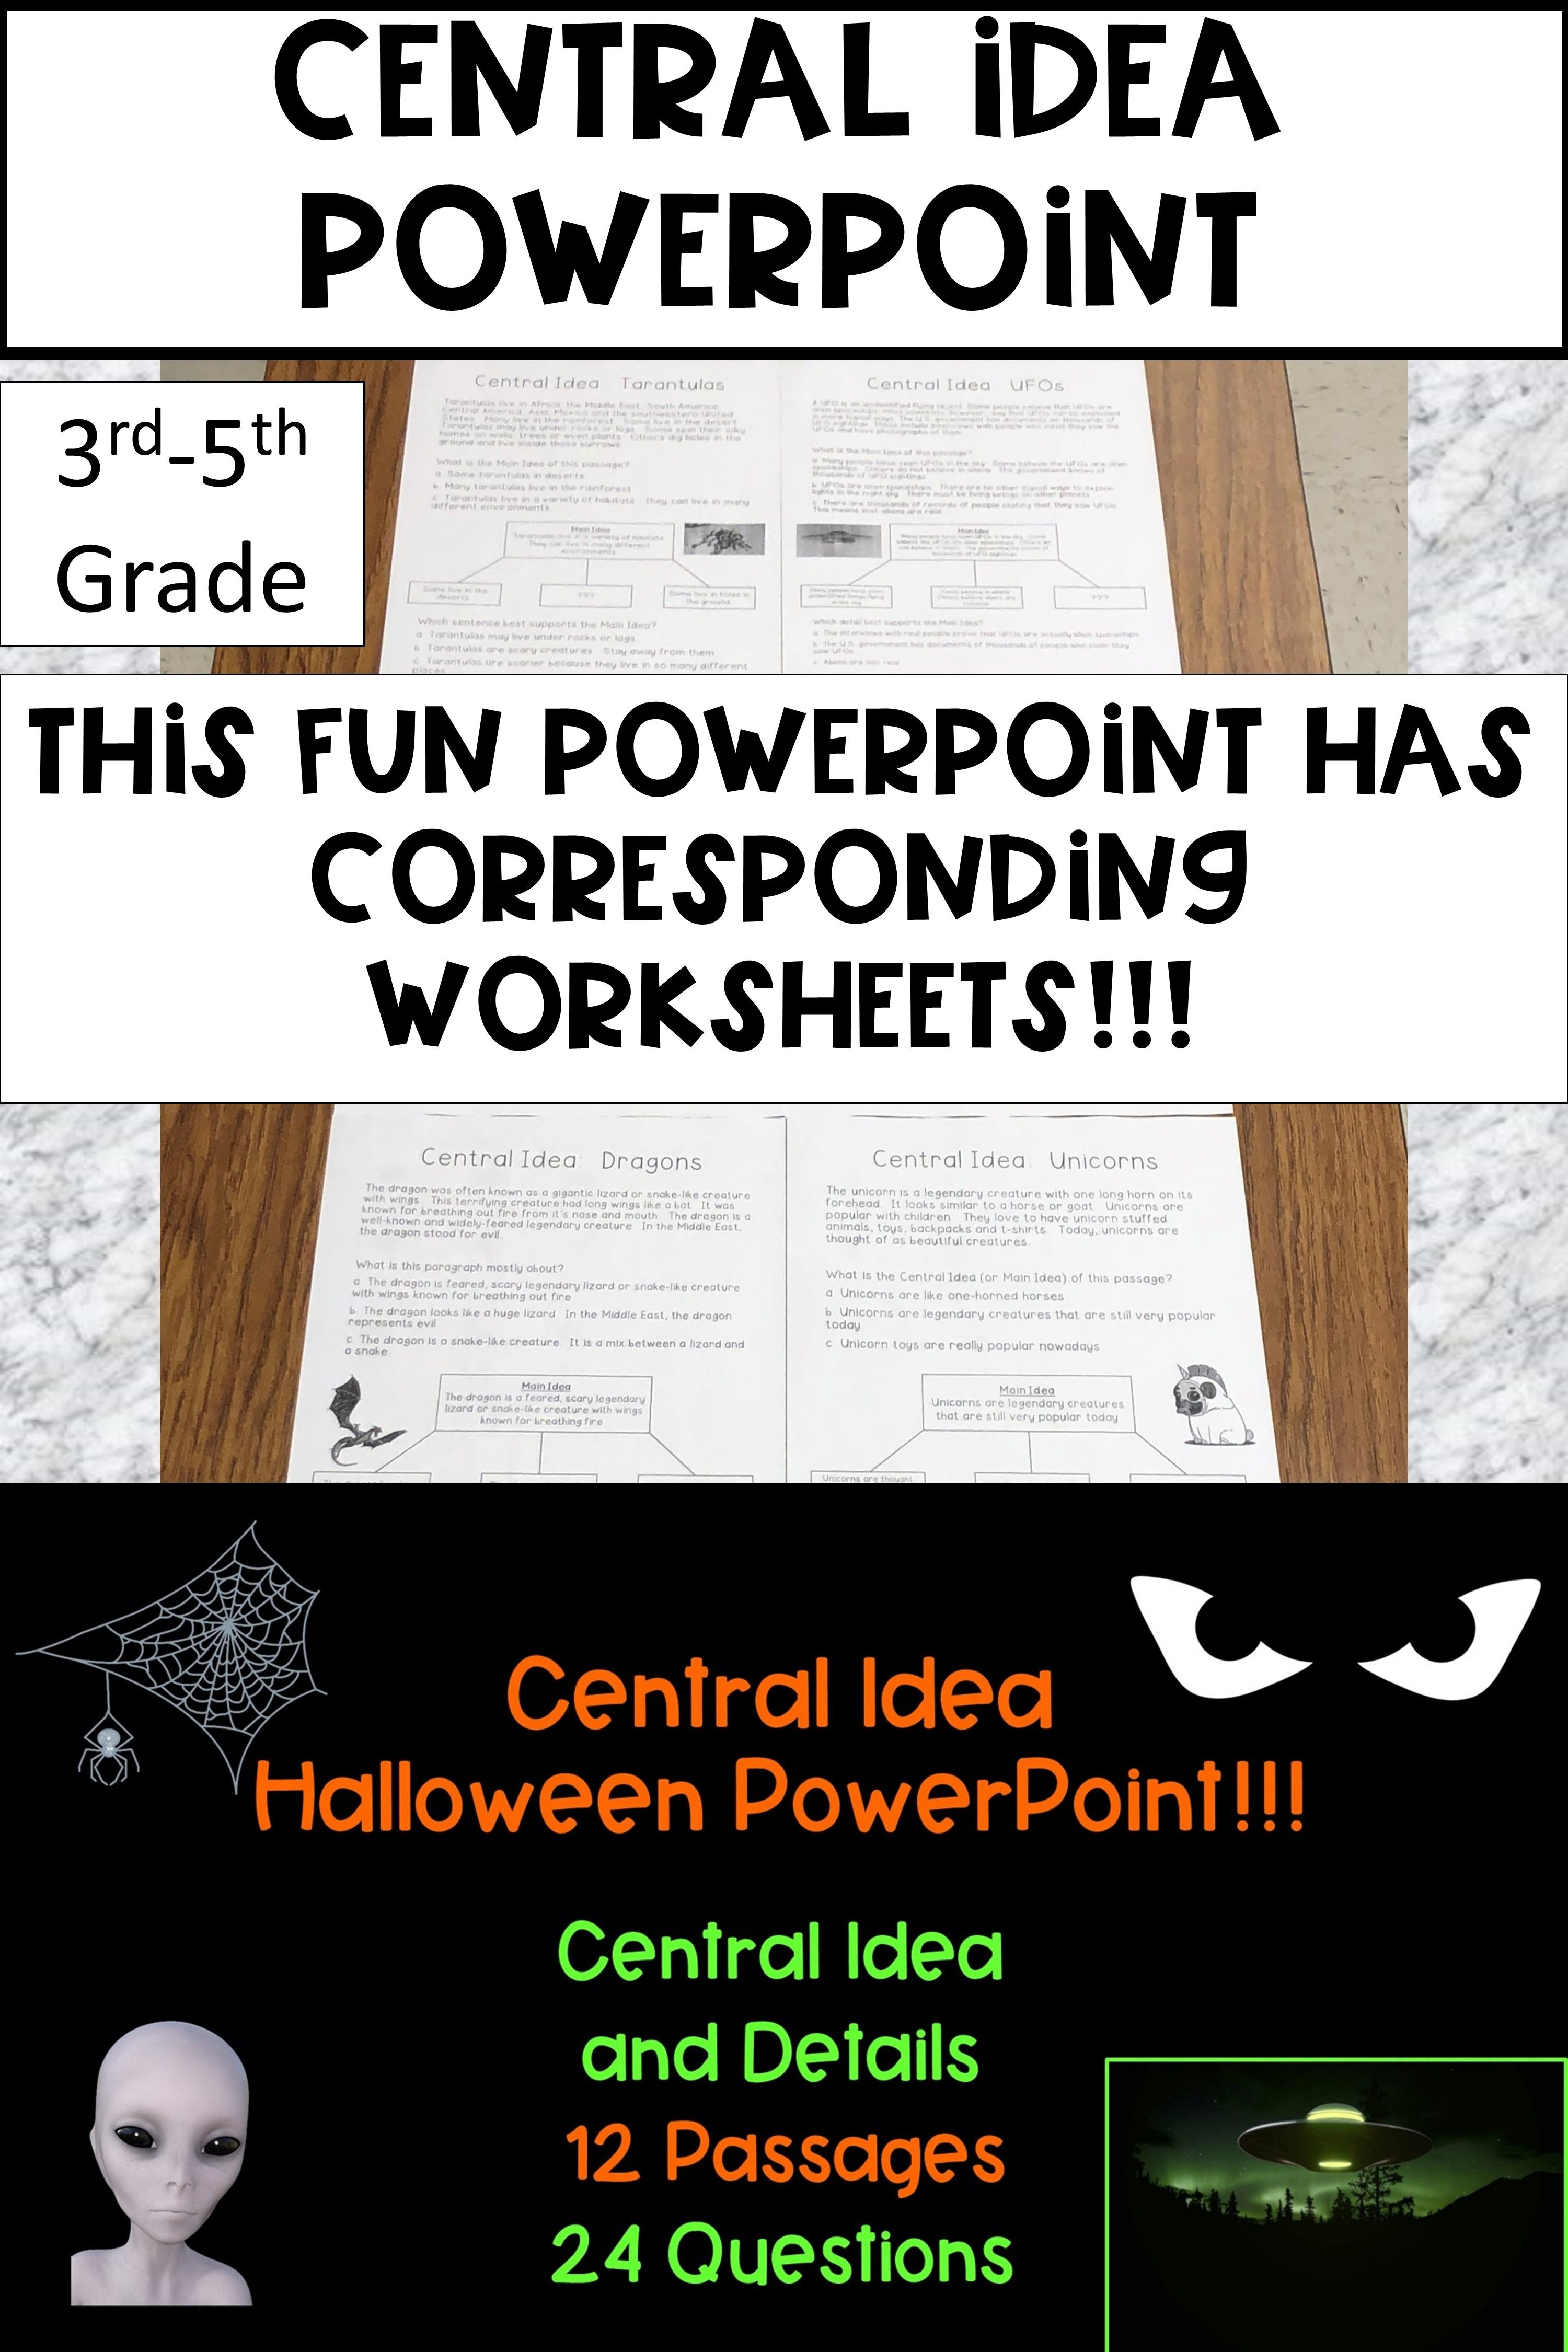 Central Idea Halloween Powerpoint Central Idea 3rd Grade Reading Elementary Ela